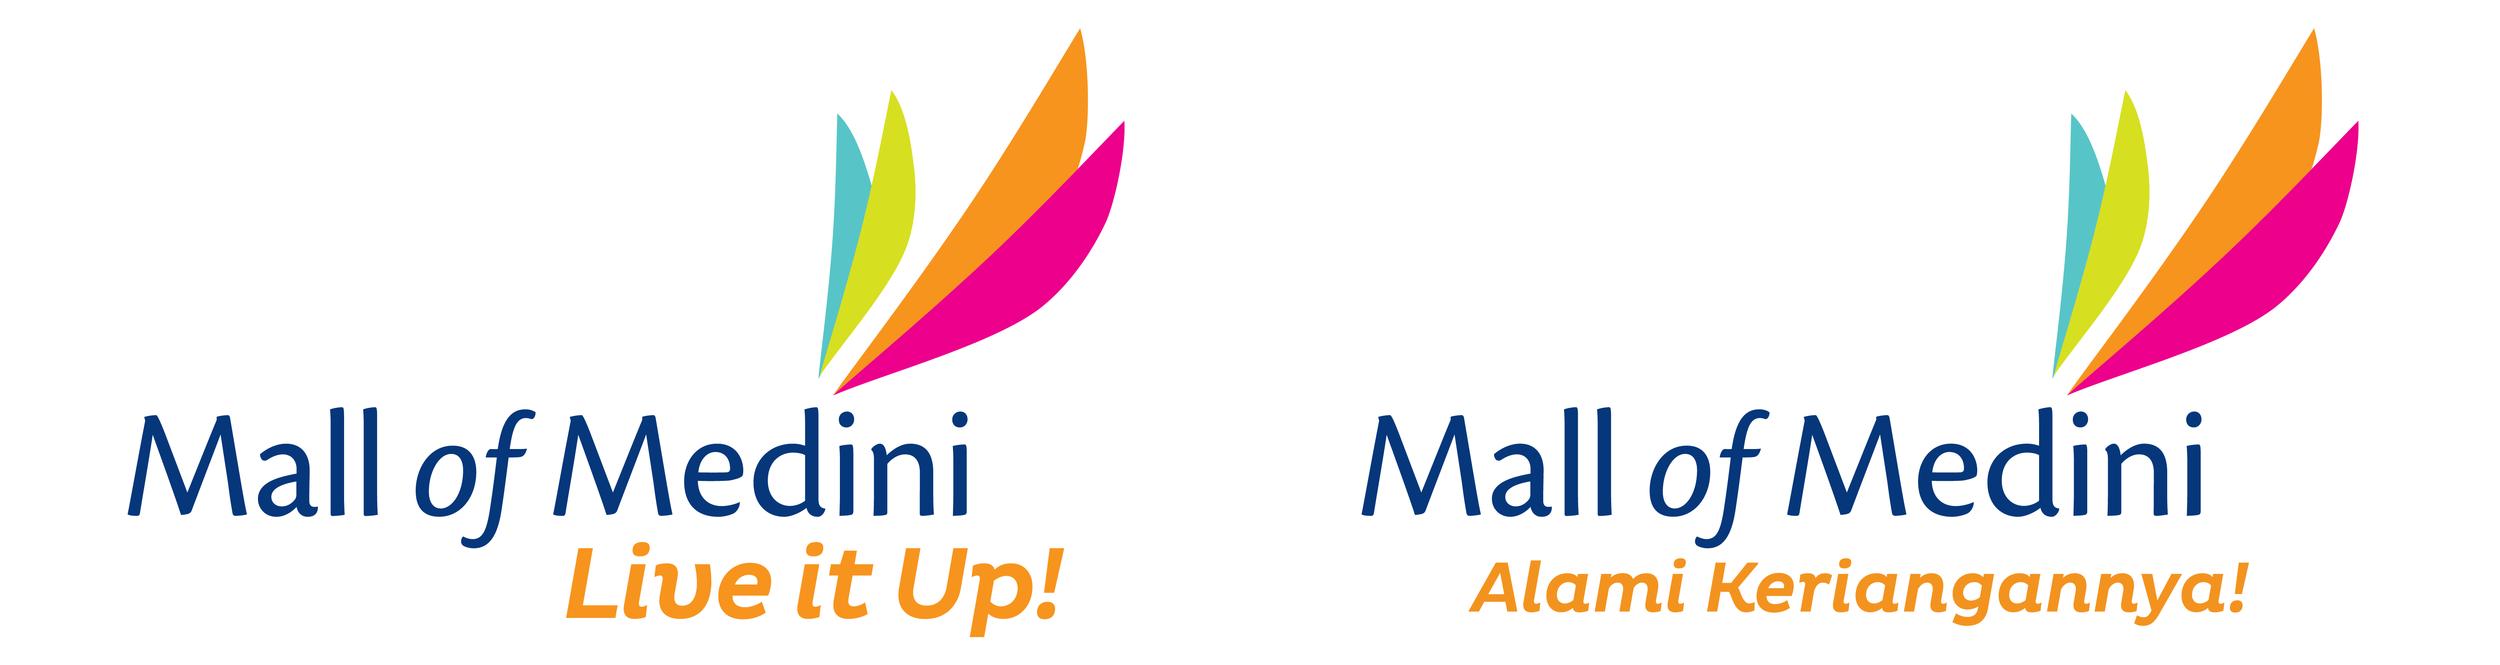 LO4c_Mall of Medini_Primary_tagline (o) for Web.png